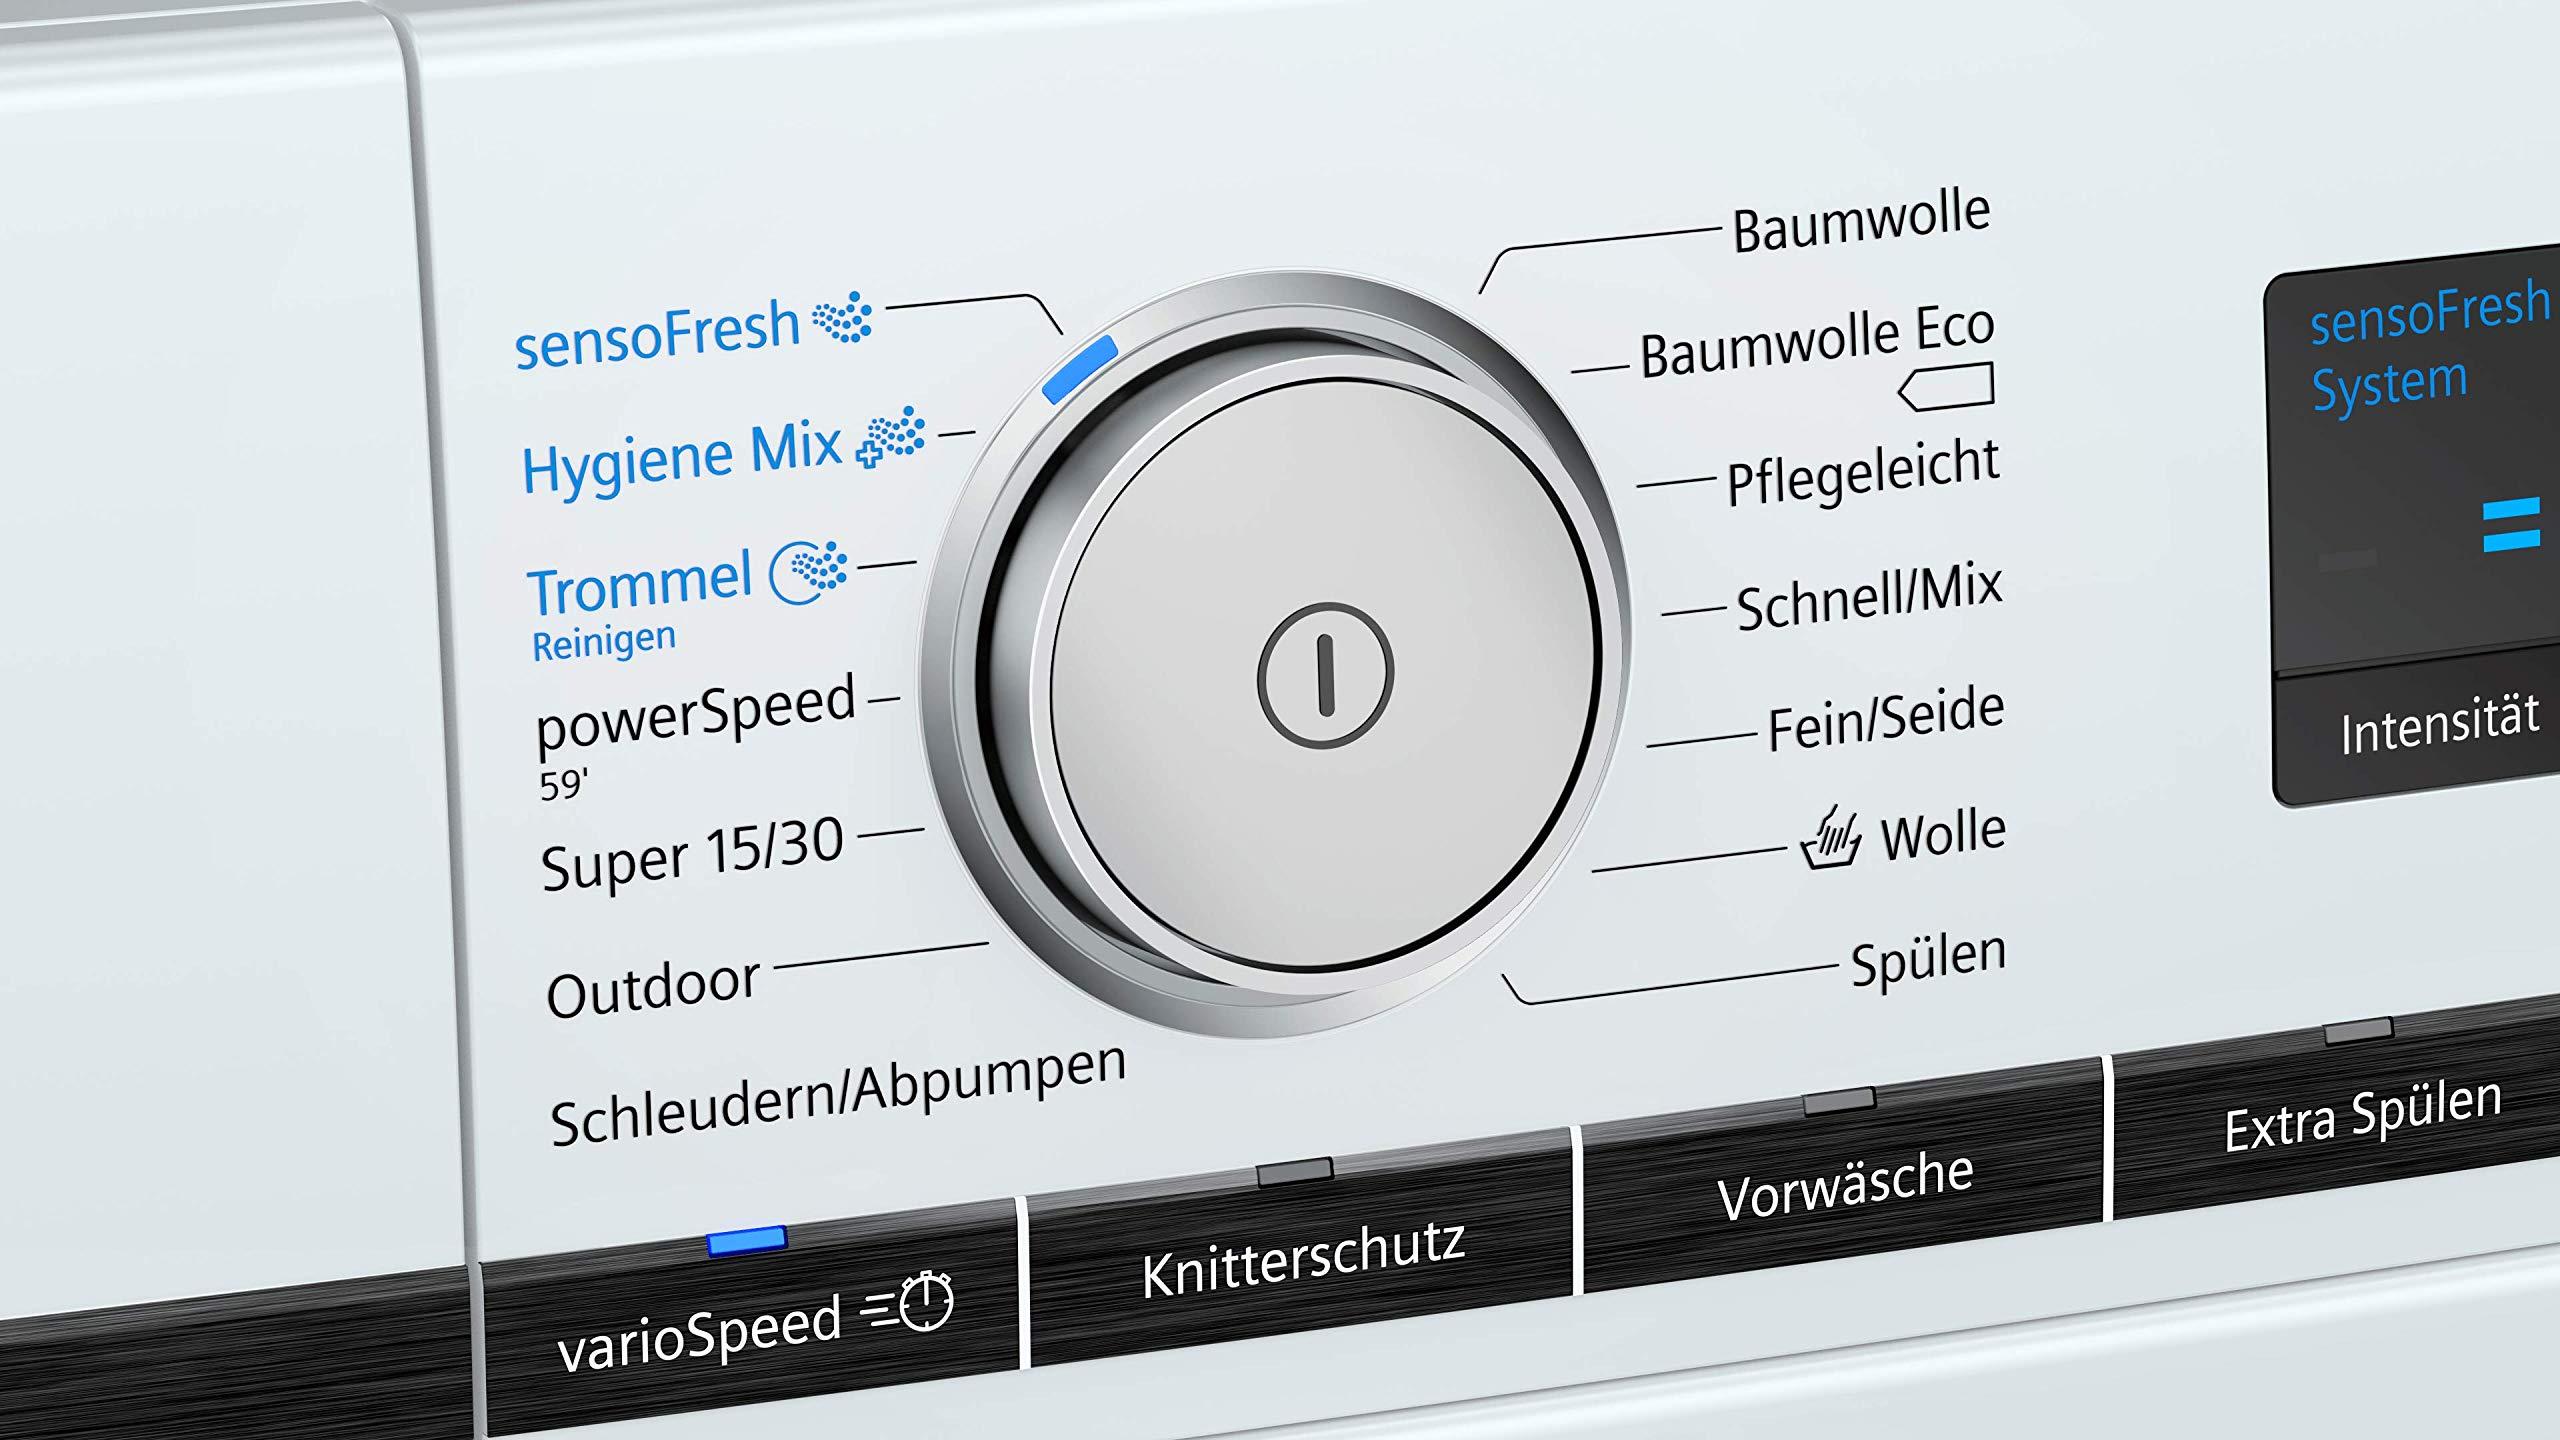 Siemens iQ700 WM14VL40 - Lavadora (9 kg, A++++, 152 kWh, 1400 u ...